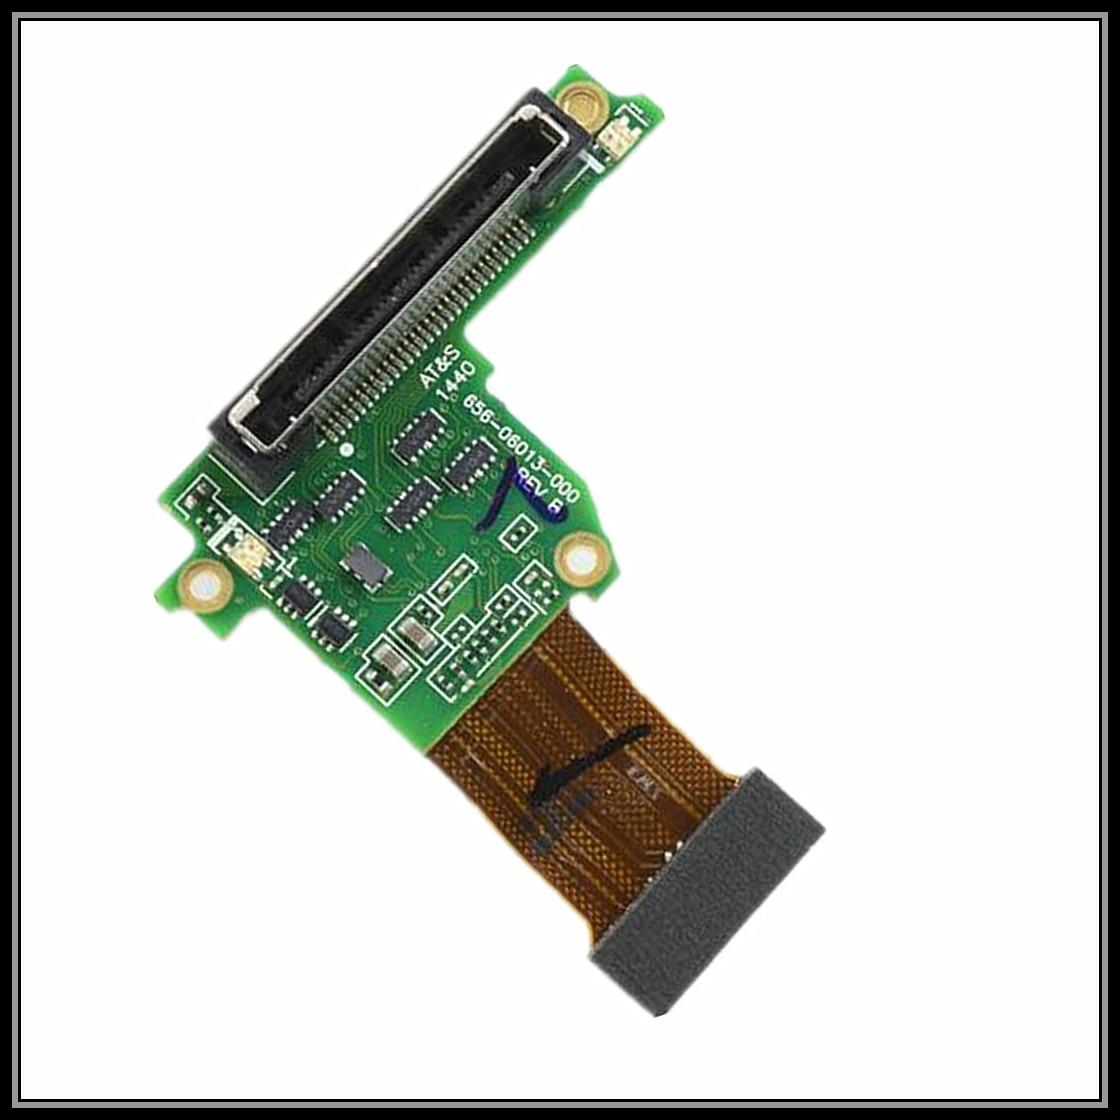 100% original Memory card Reader for Gopro hero 4 GOPRO4 Expansion Port - Used memory expansion